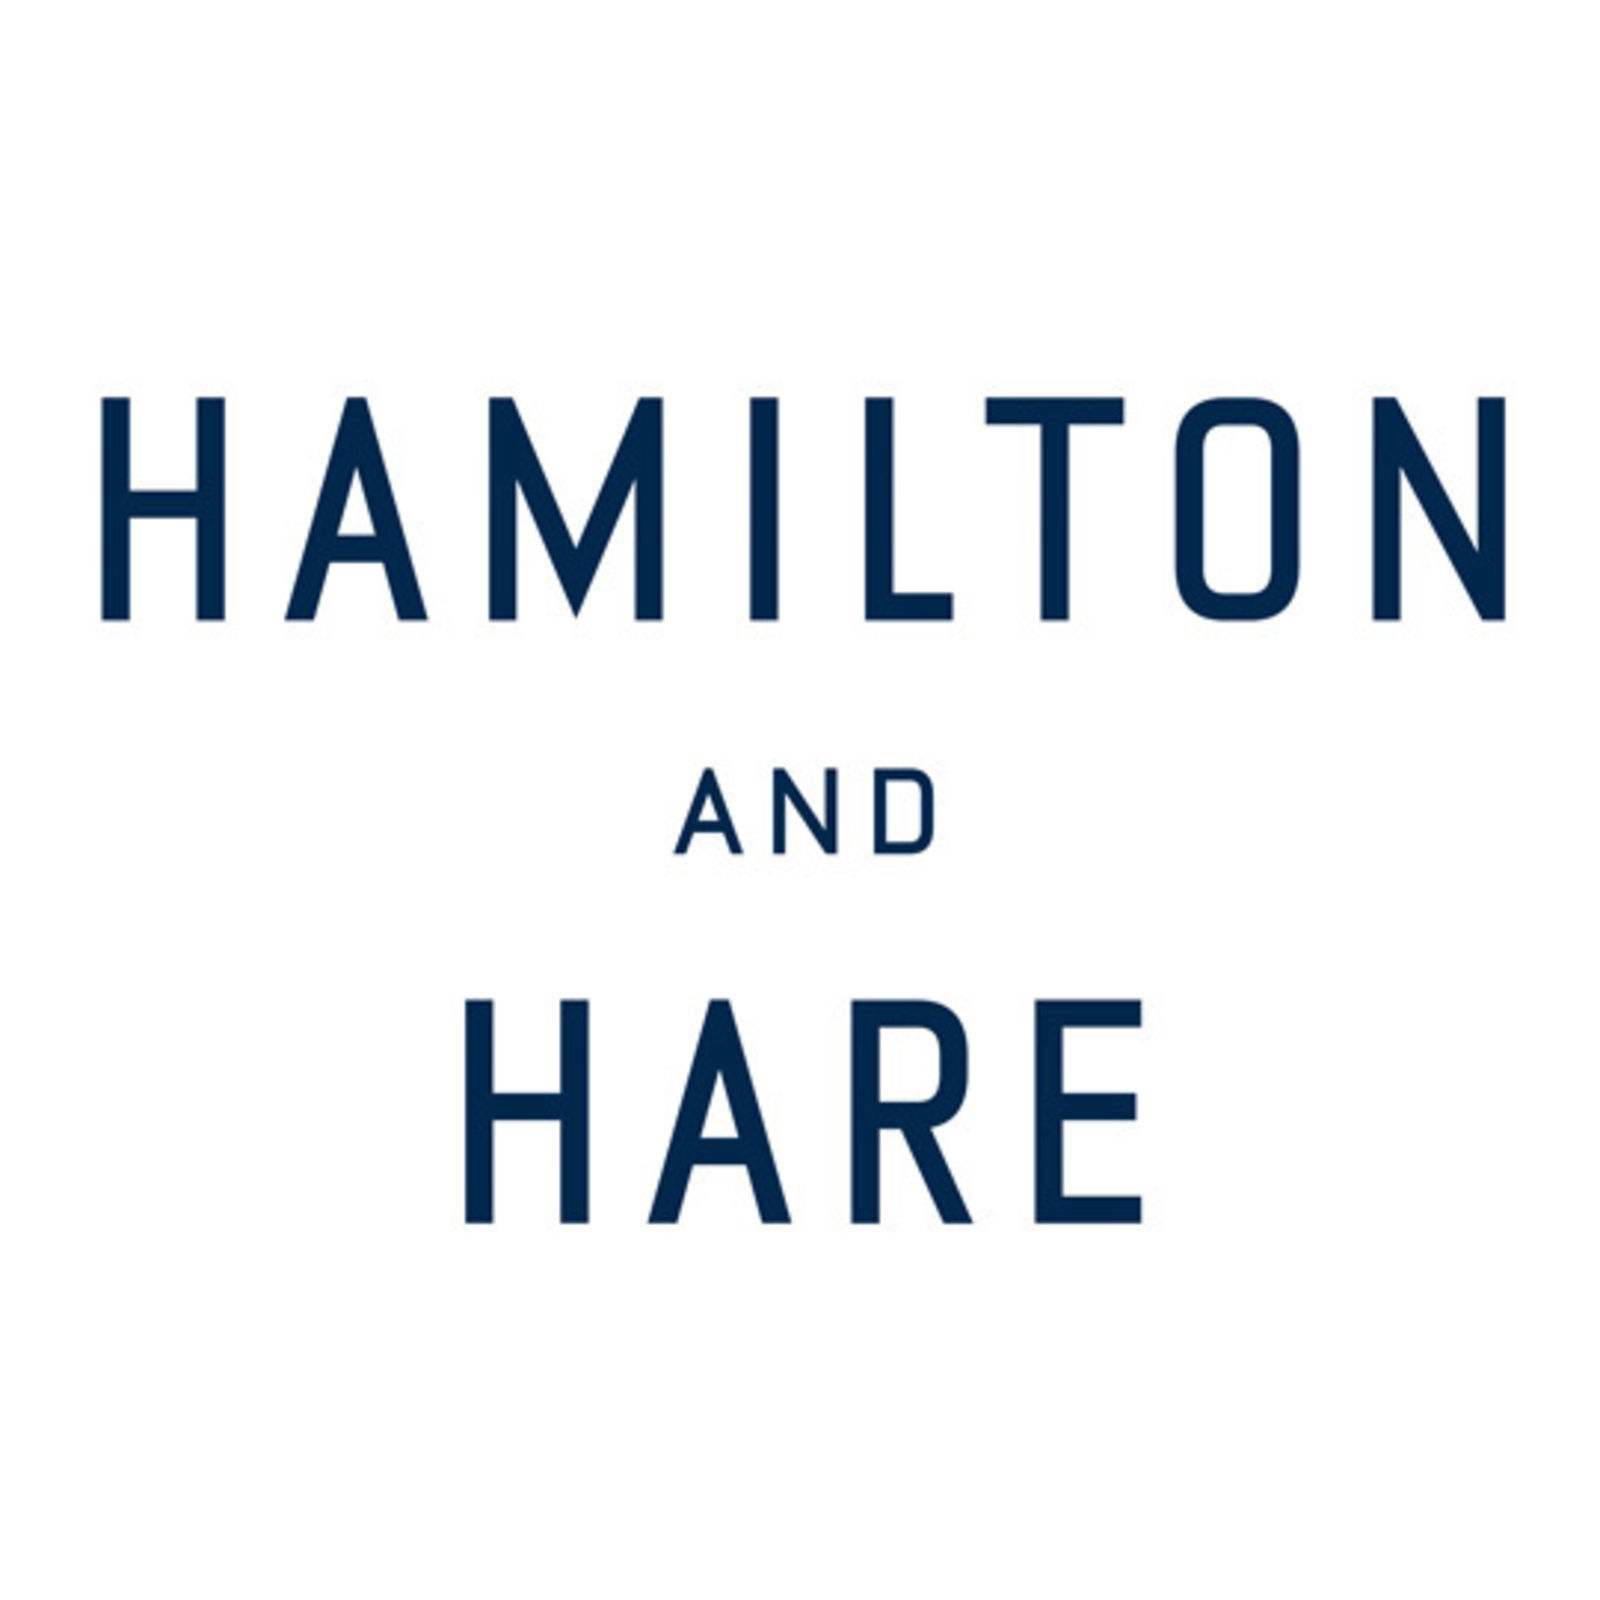 HAMILTON AND HARE